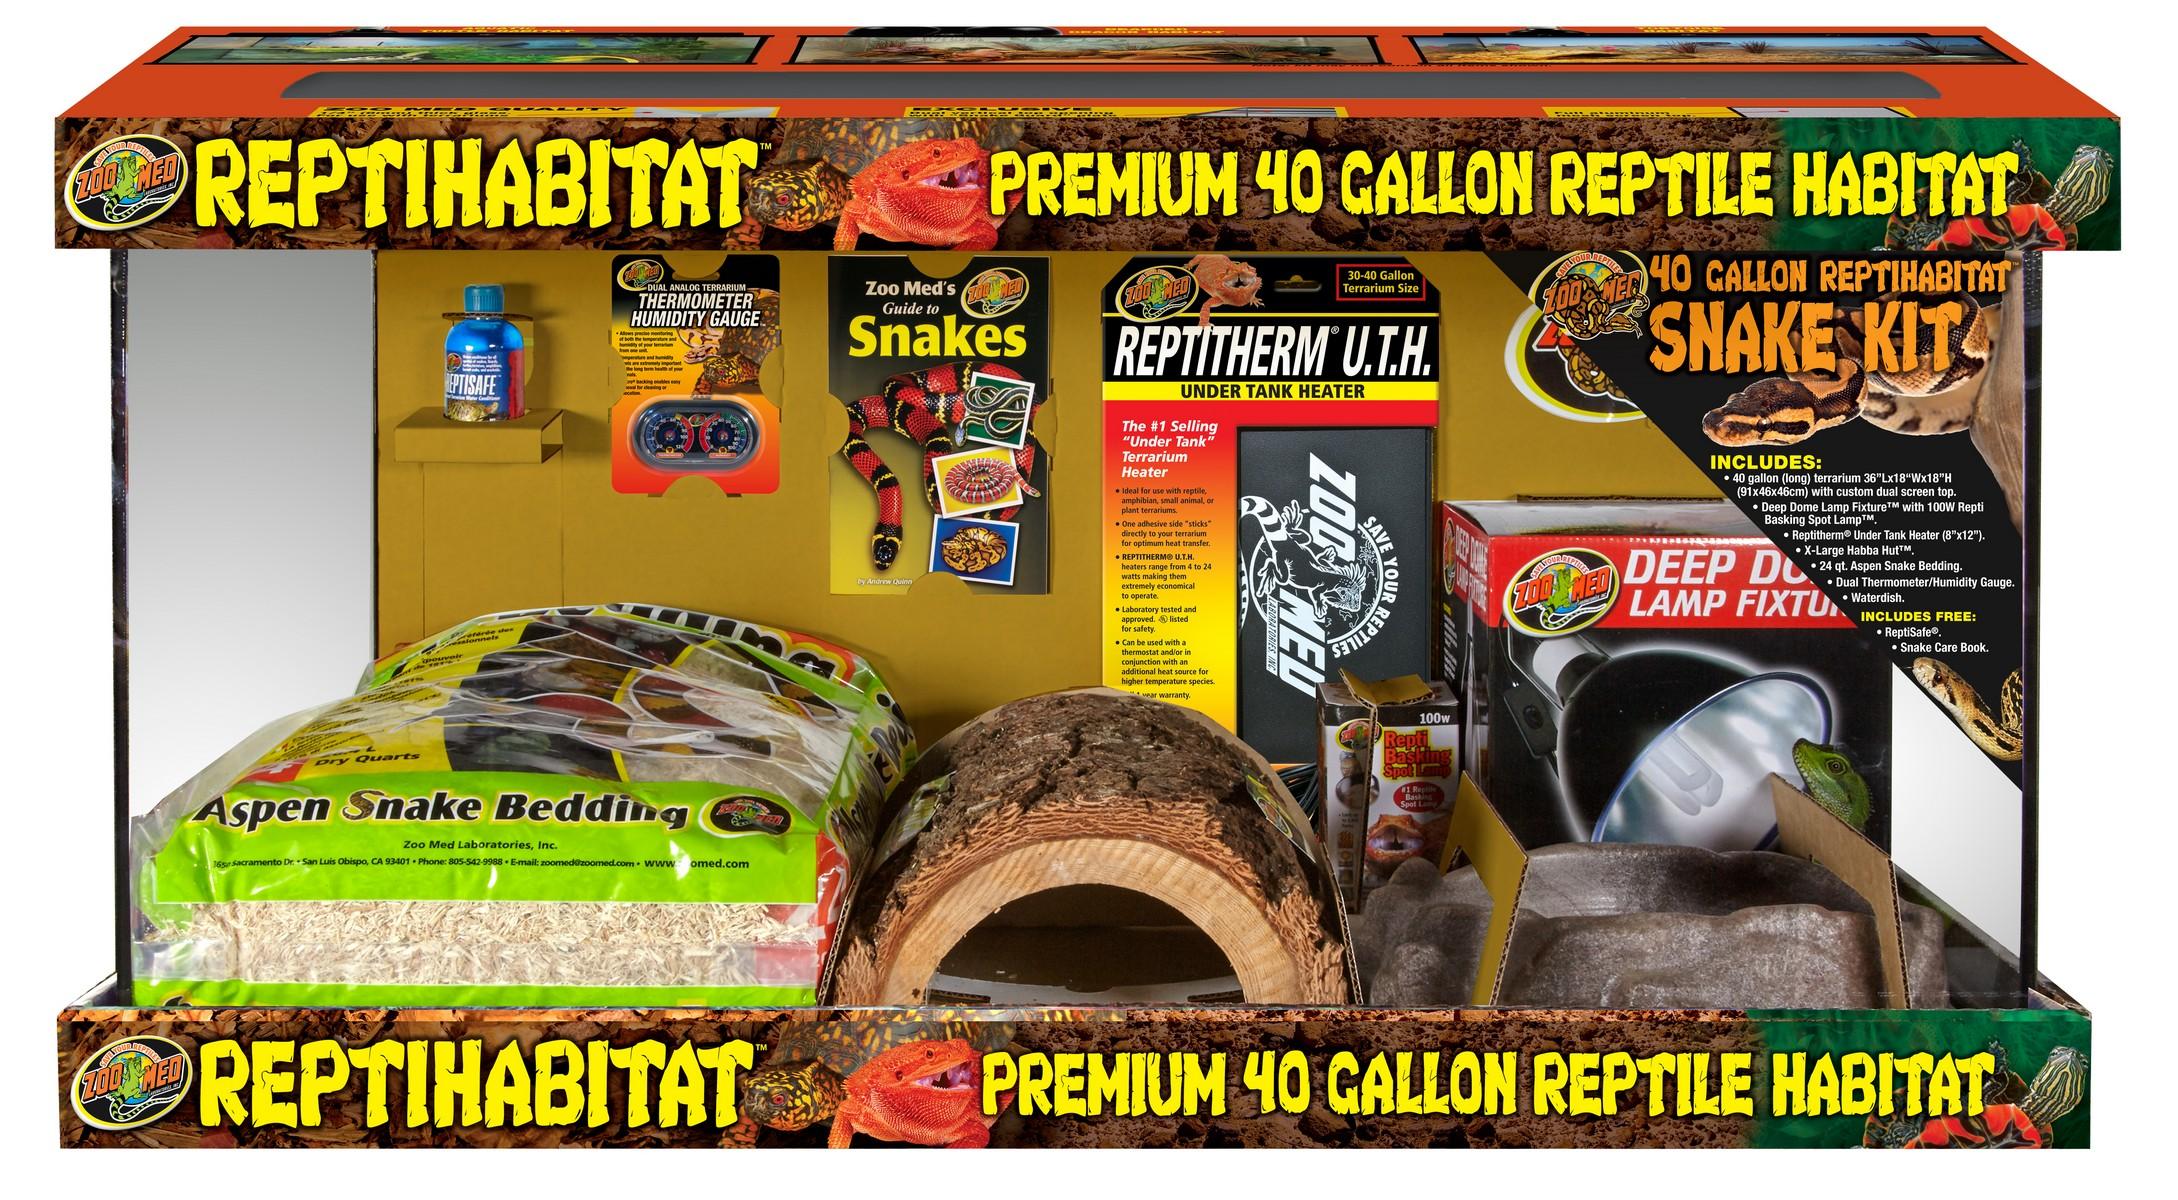 Zoo Med Reptihabitat Snake Kit Premium Reptile Habitat, 40-gallon